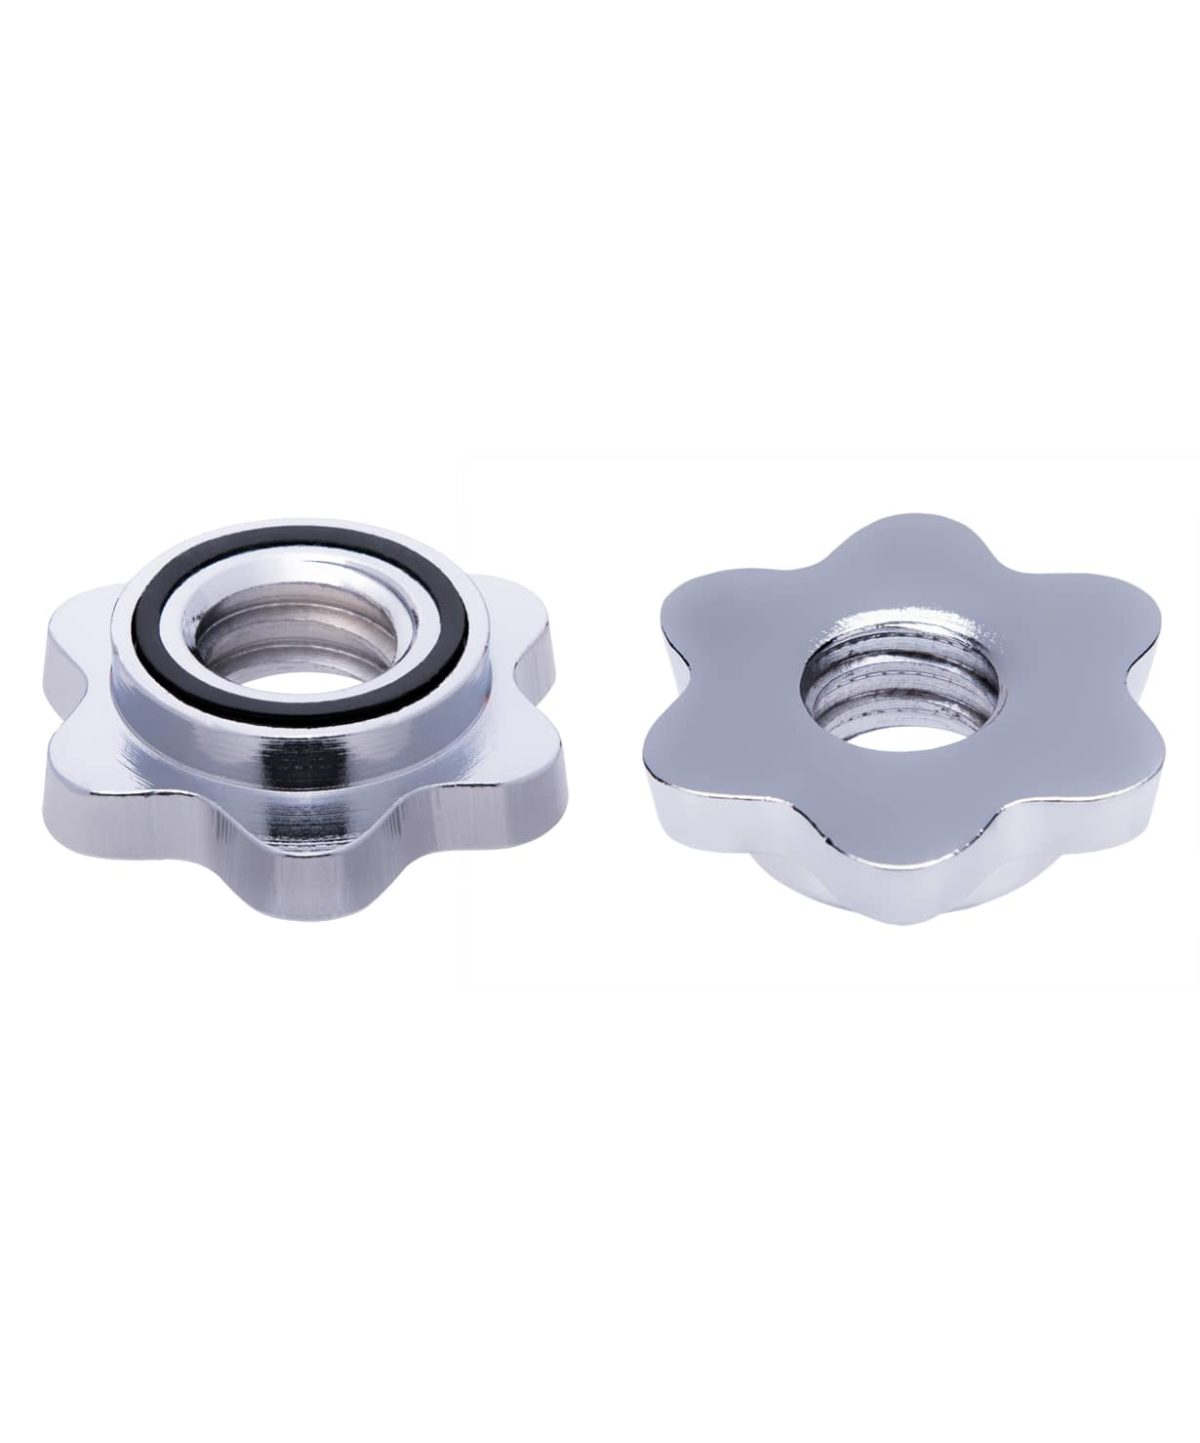 STARFIT Комплект замков для грифа металлические d=26 мм BB-108 - 1